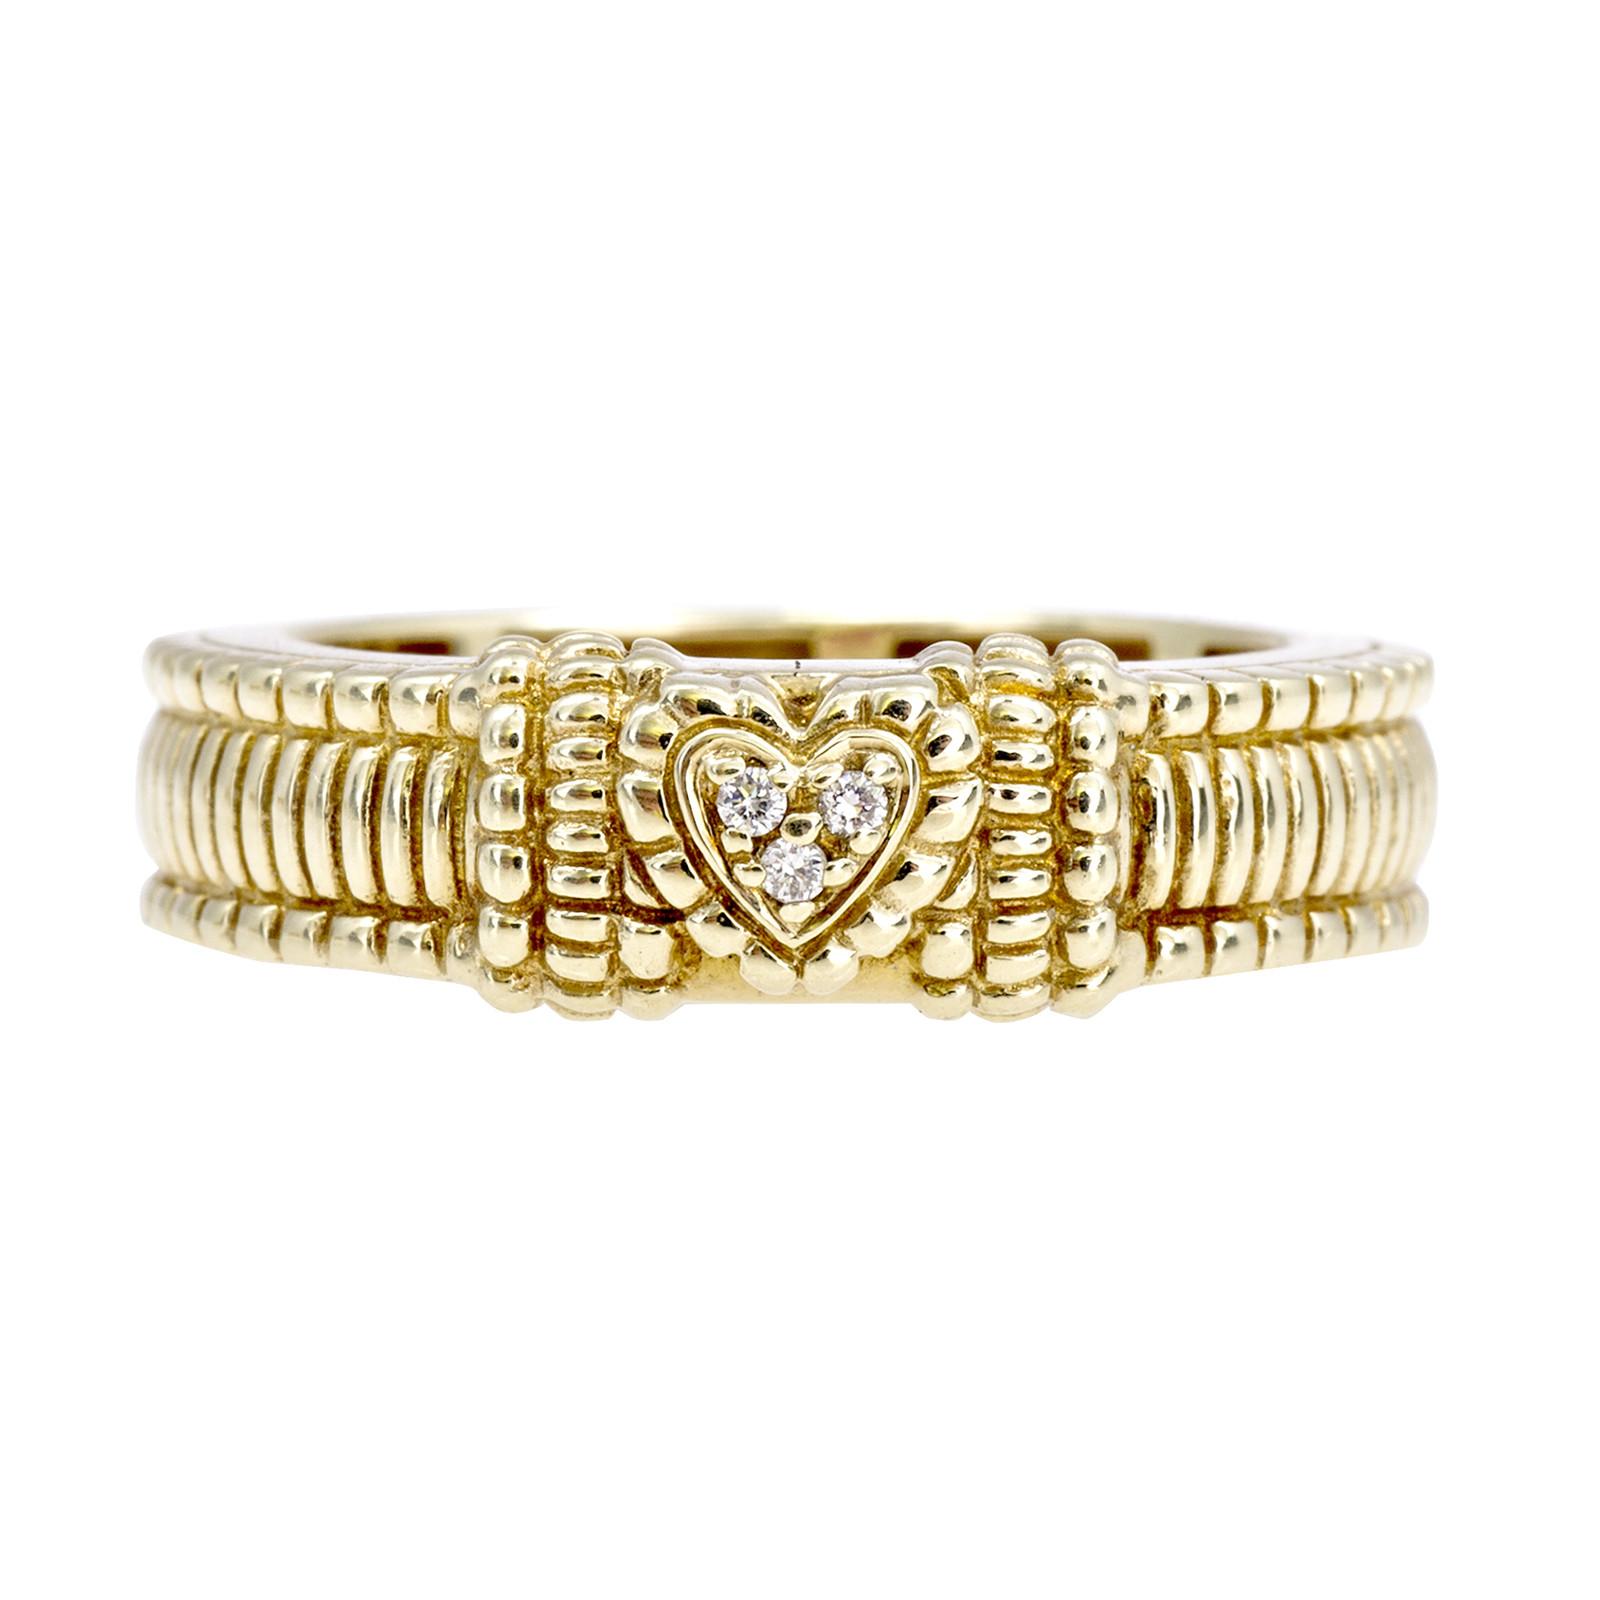 Vintage Judith Ripka 0.02 CTW Diamond Heart Ring